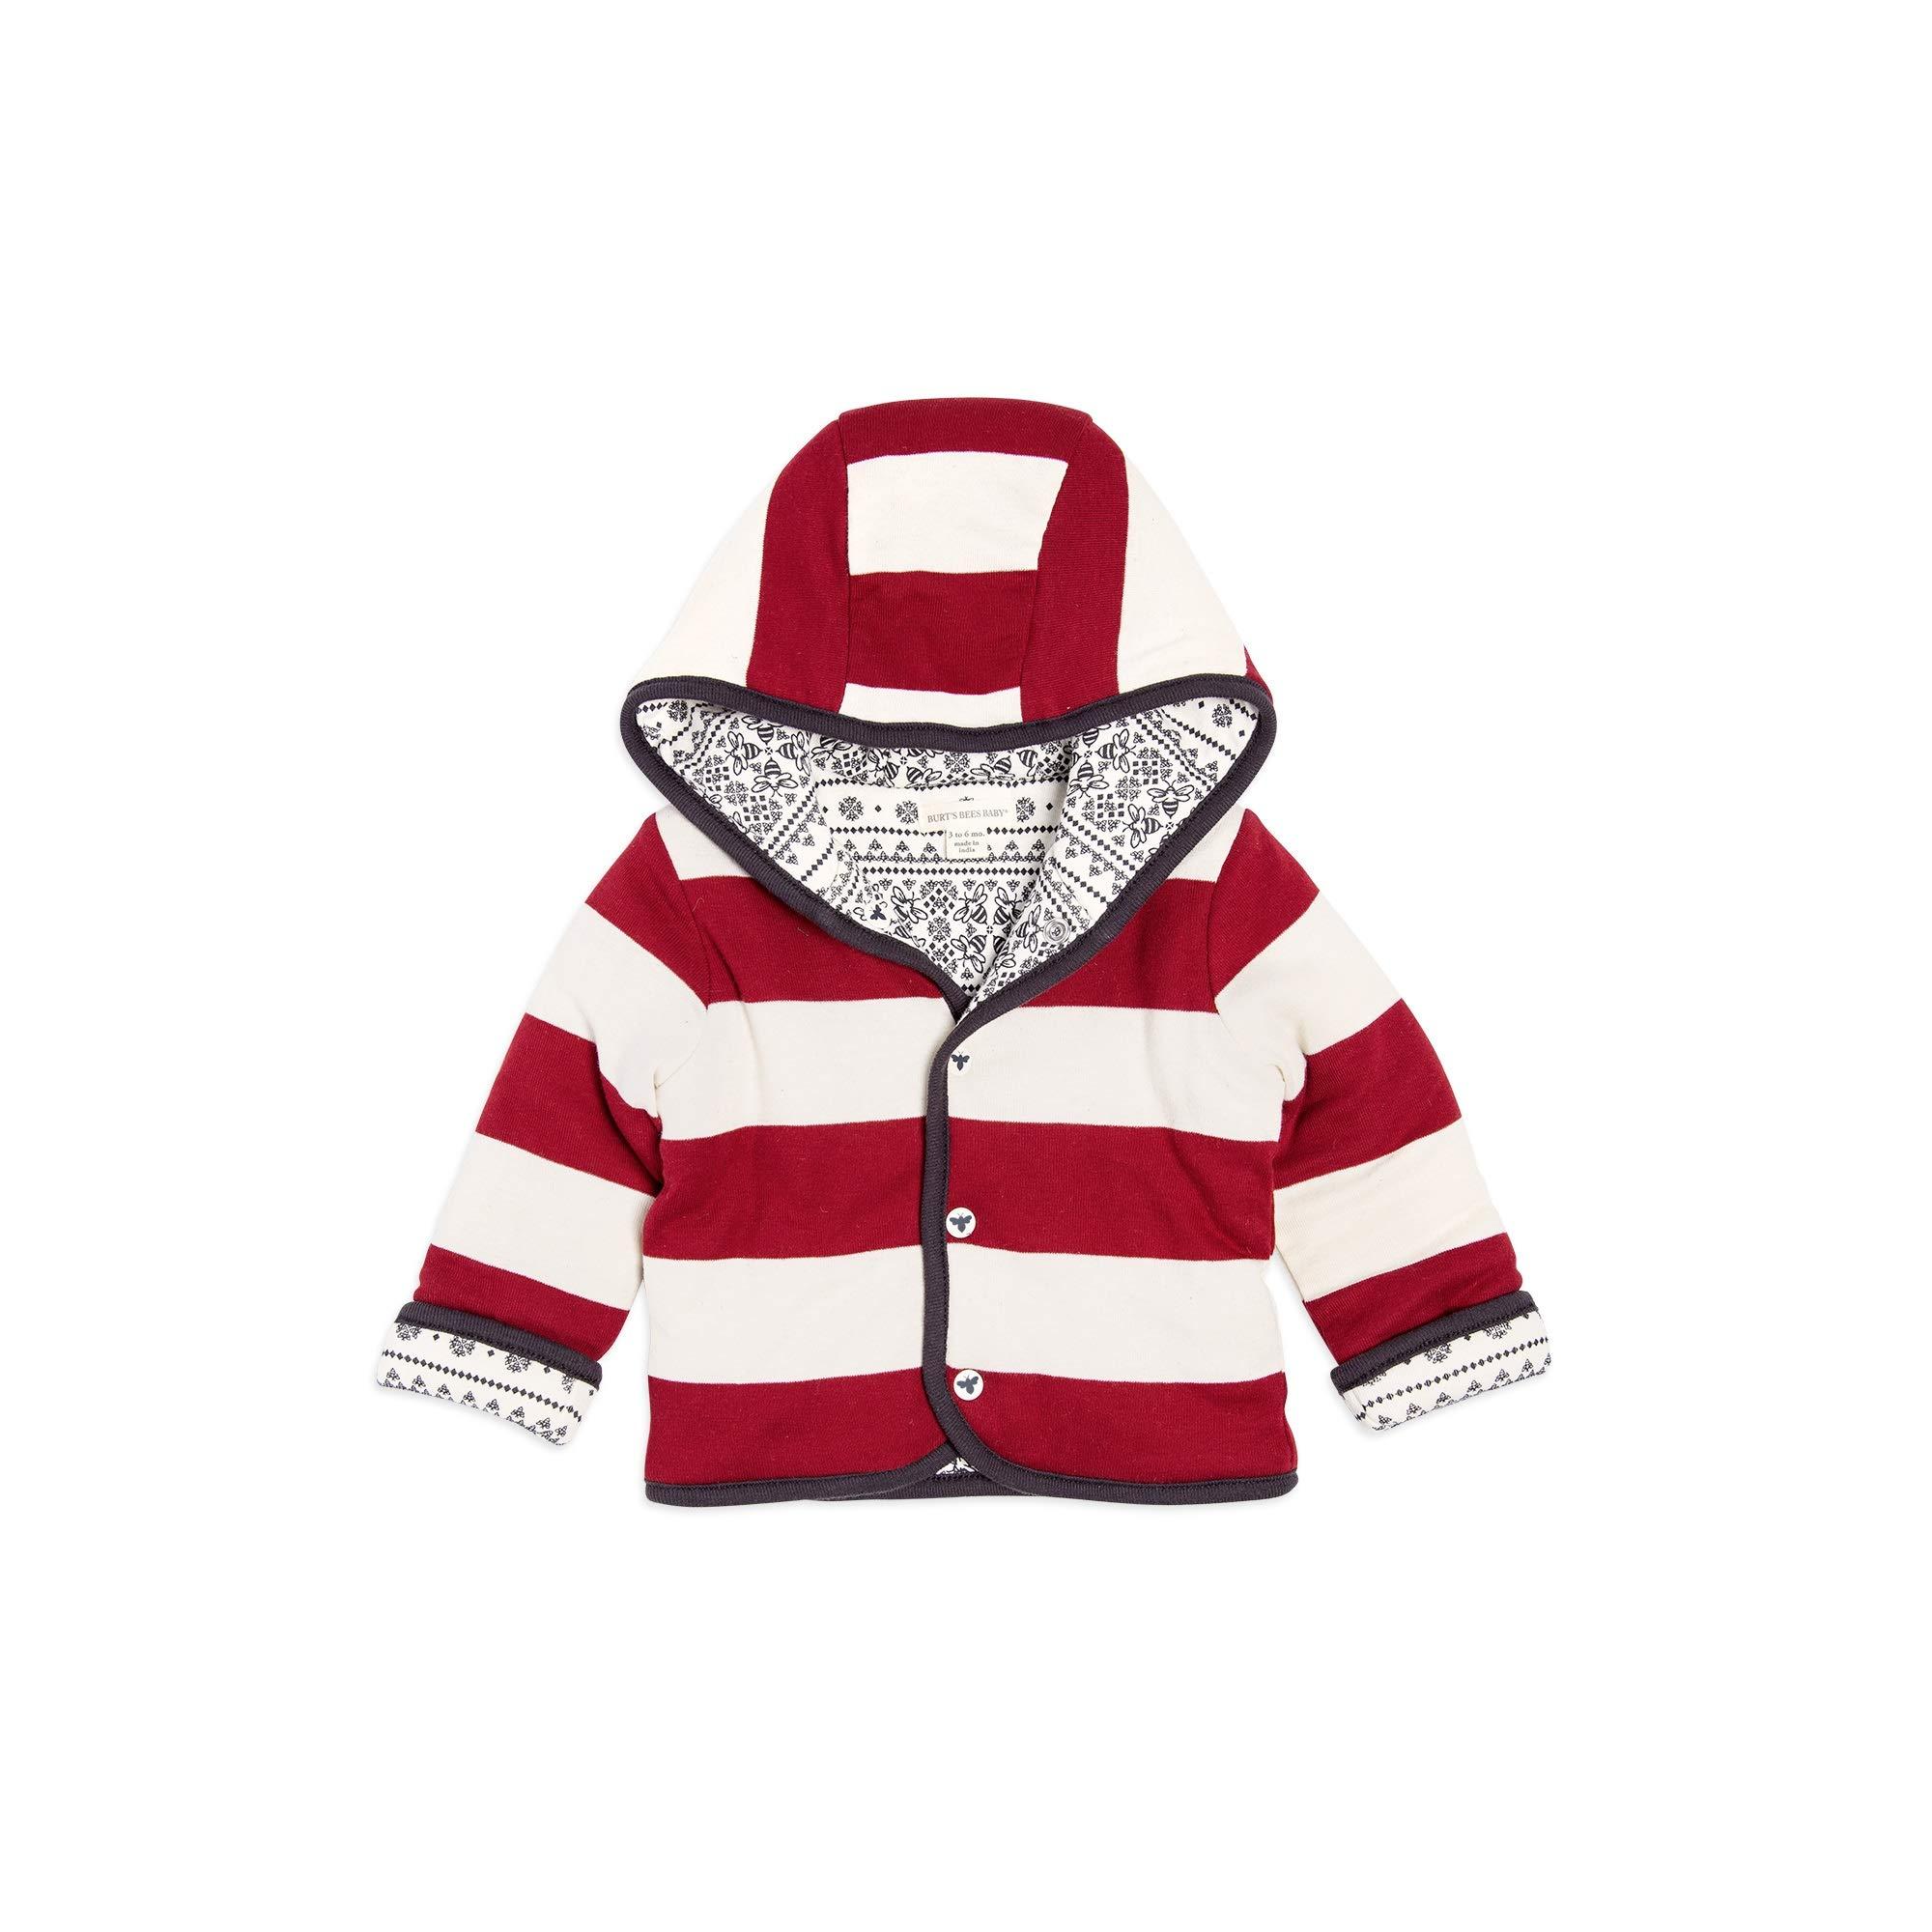 Burt's Bees Baby Jacket, Hooded Coat, 100% Organic Cotton, Cranberry Fair Isle Reversible, 18 Months